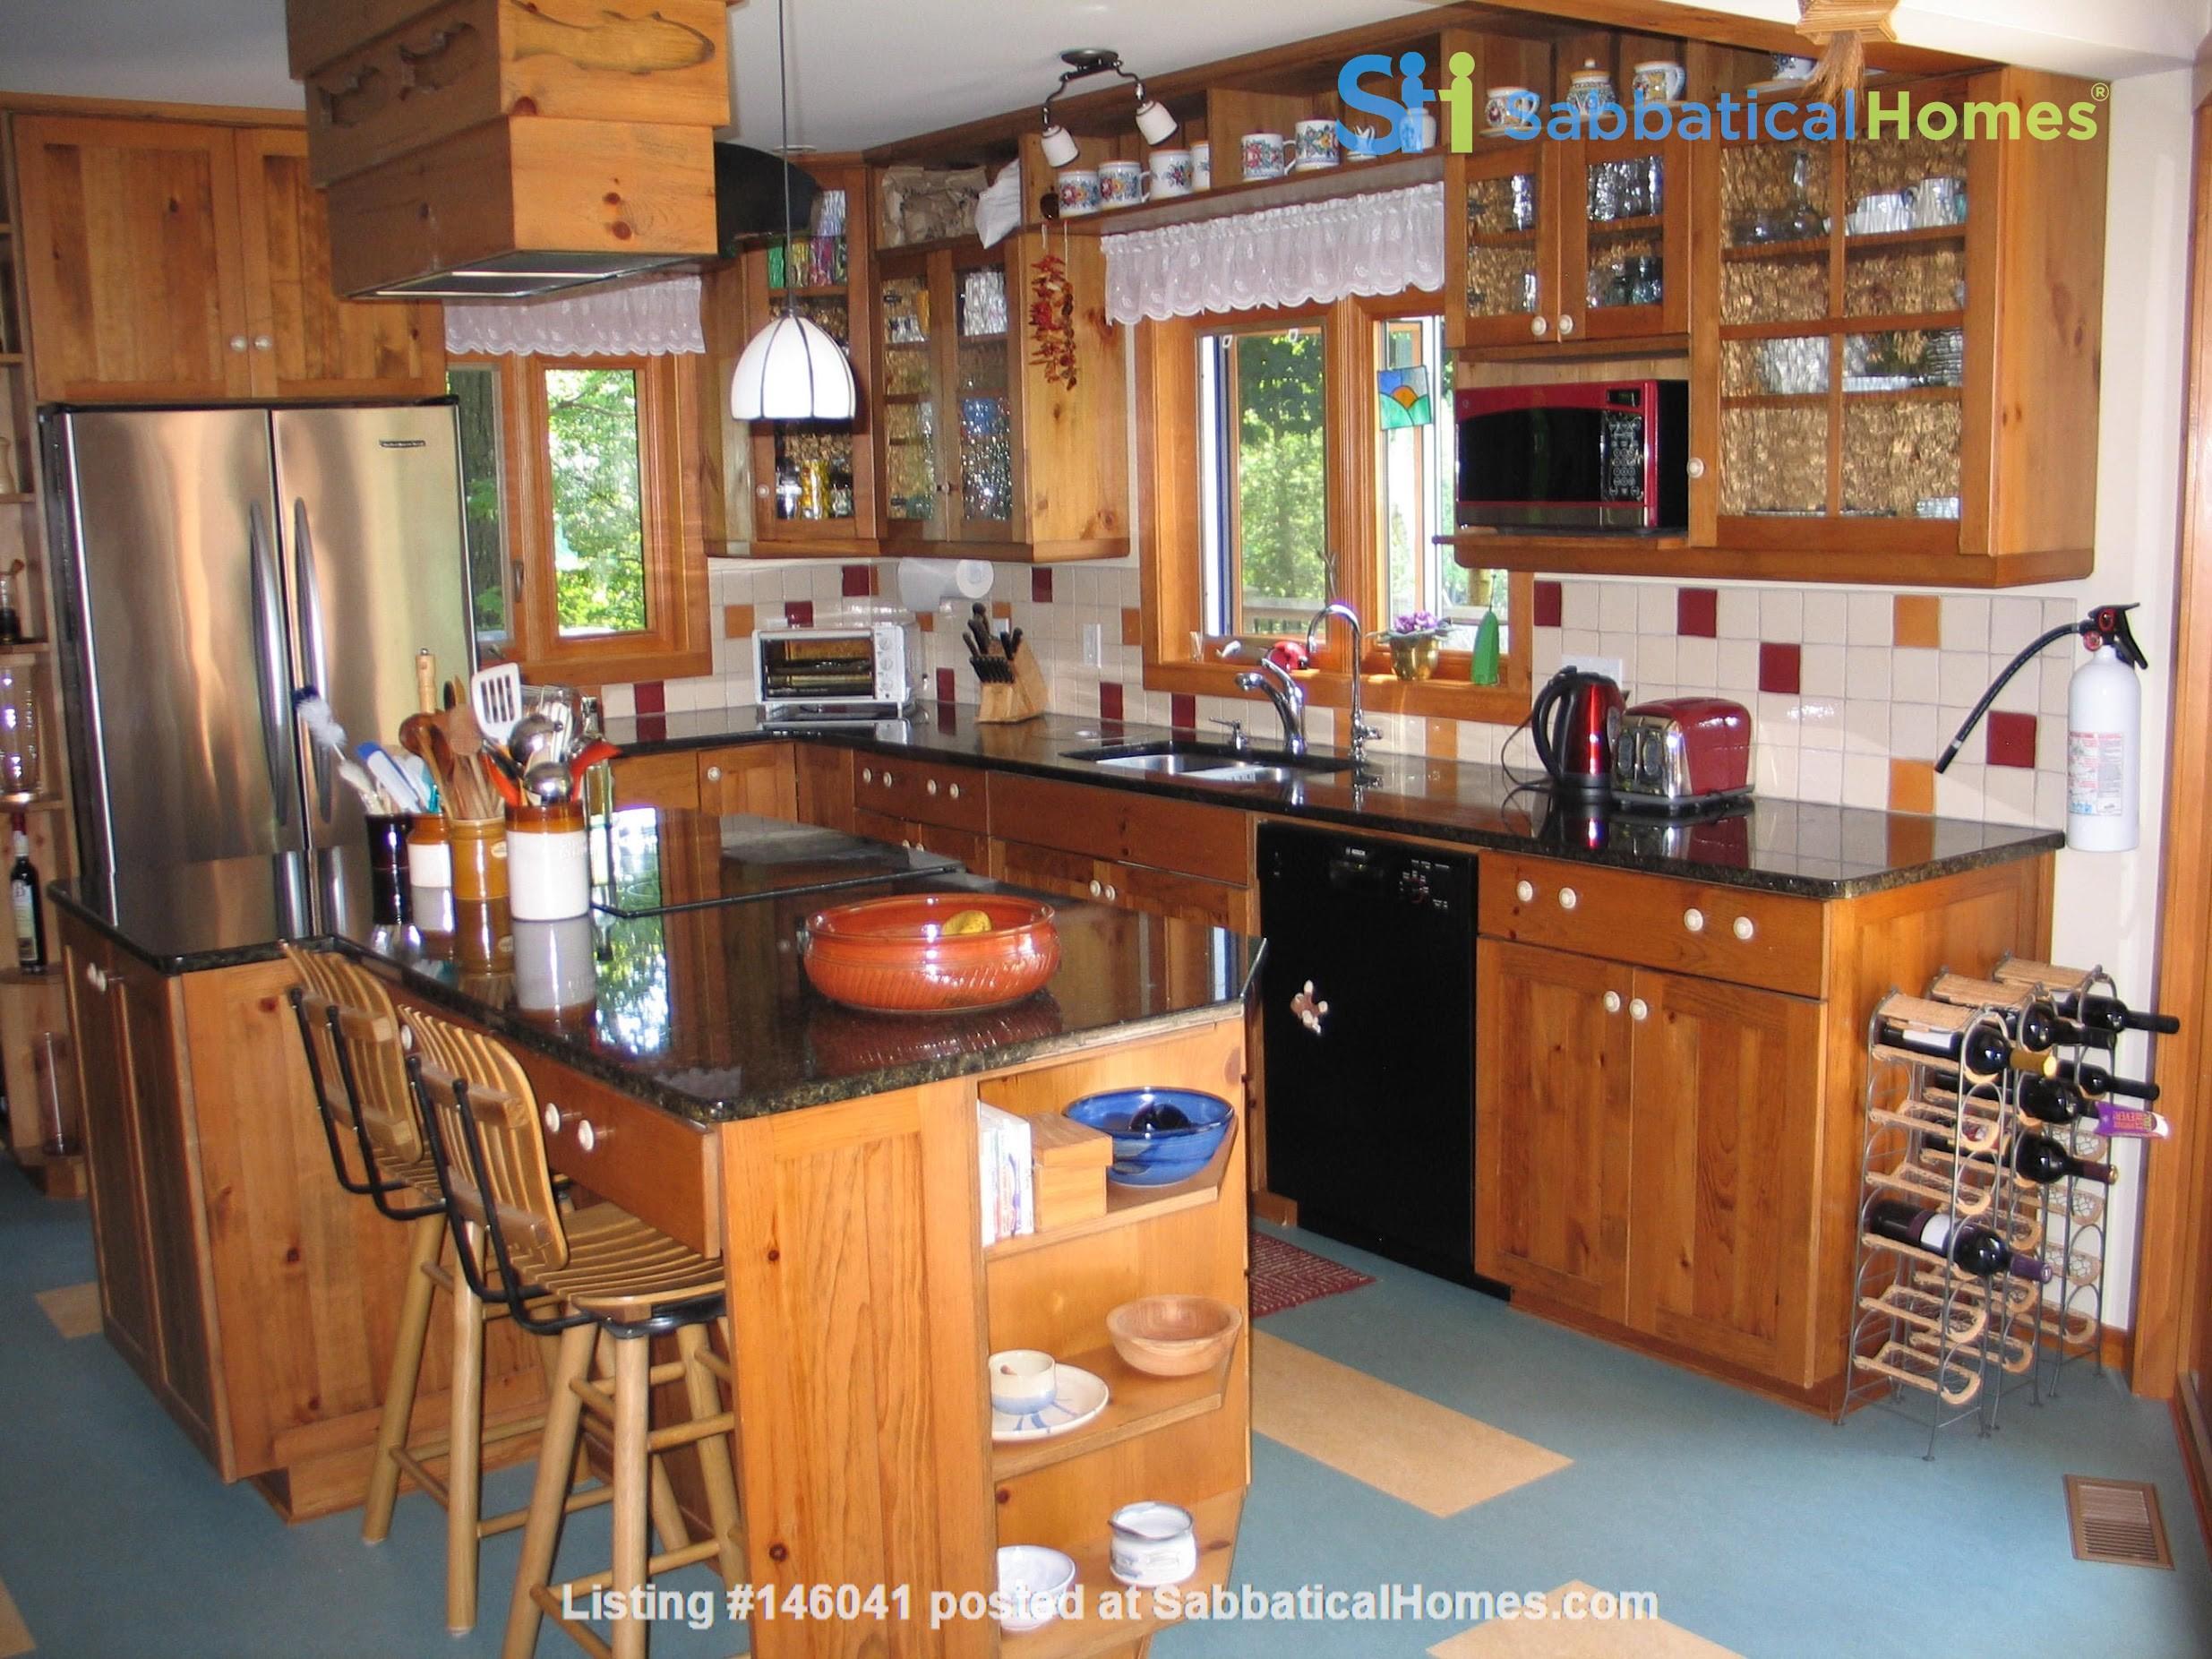 Beautiful nature retreat on lake Home Rental in  2